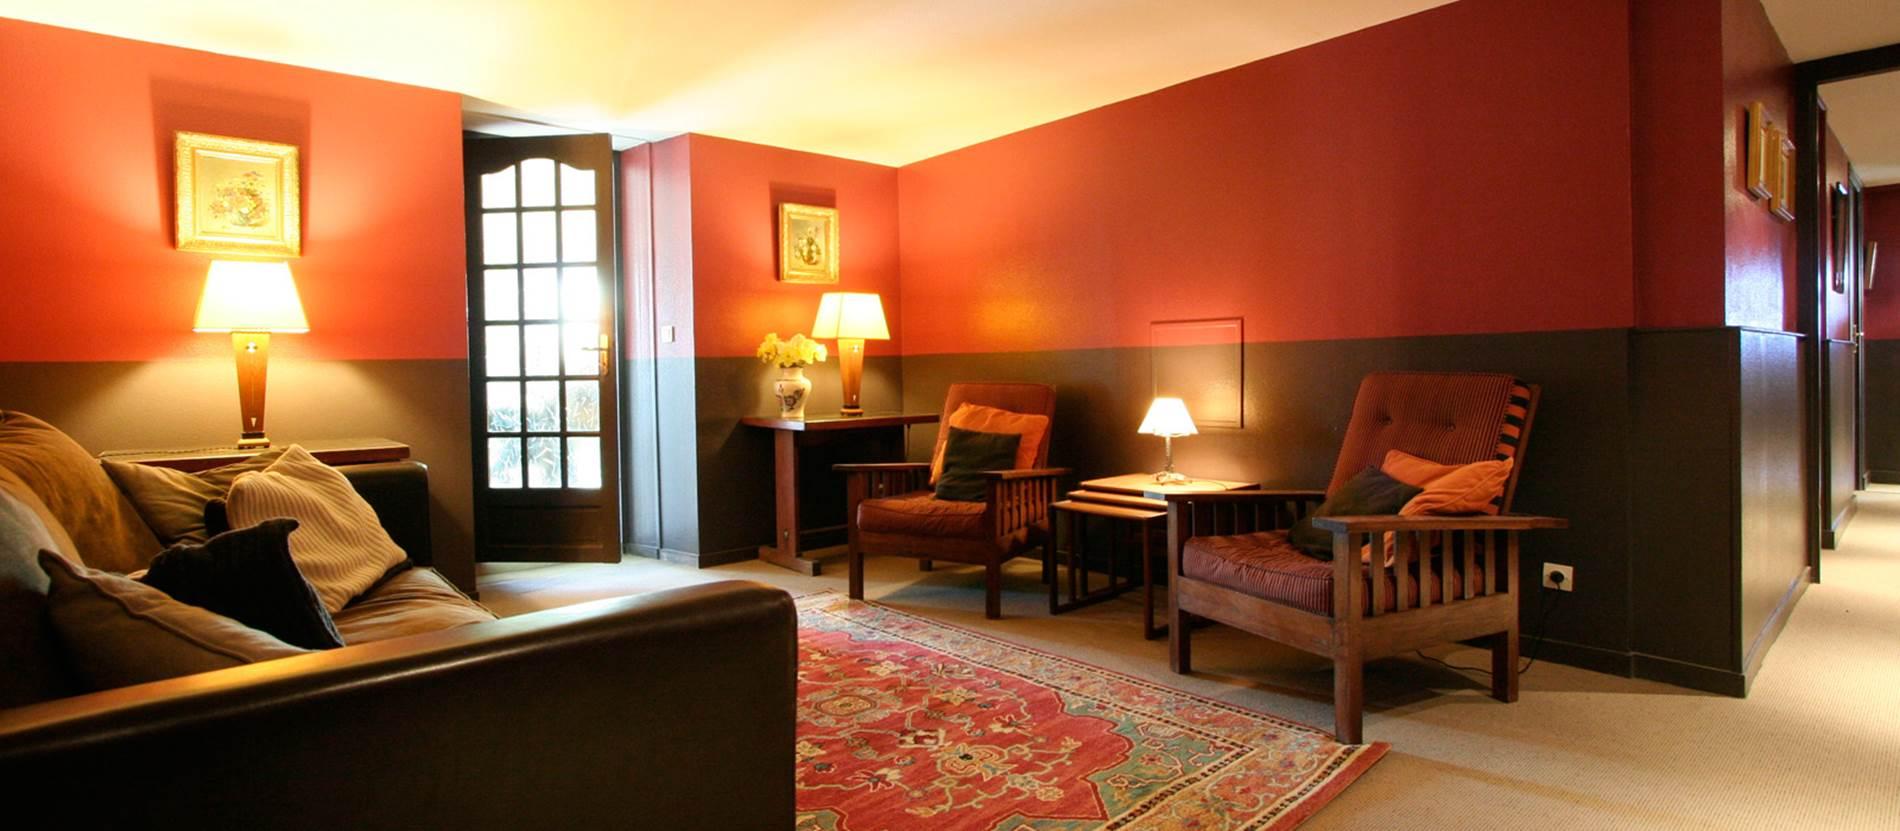 Hotel-Restaurant-Le-Grand-Large-Bangor-Morbihan-Bretagne-Sud © Hotel-Restaurant-Le-Grand-Large-Bangor